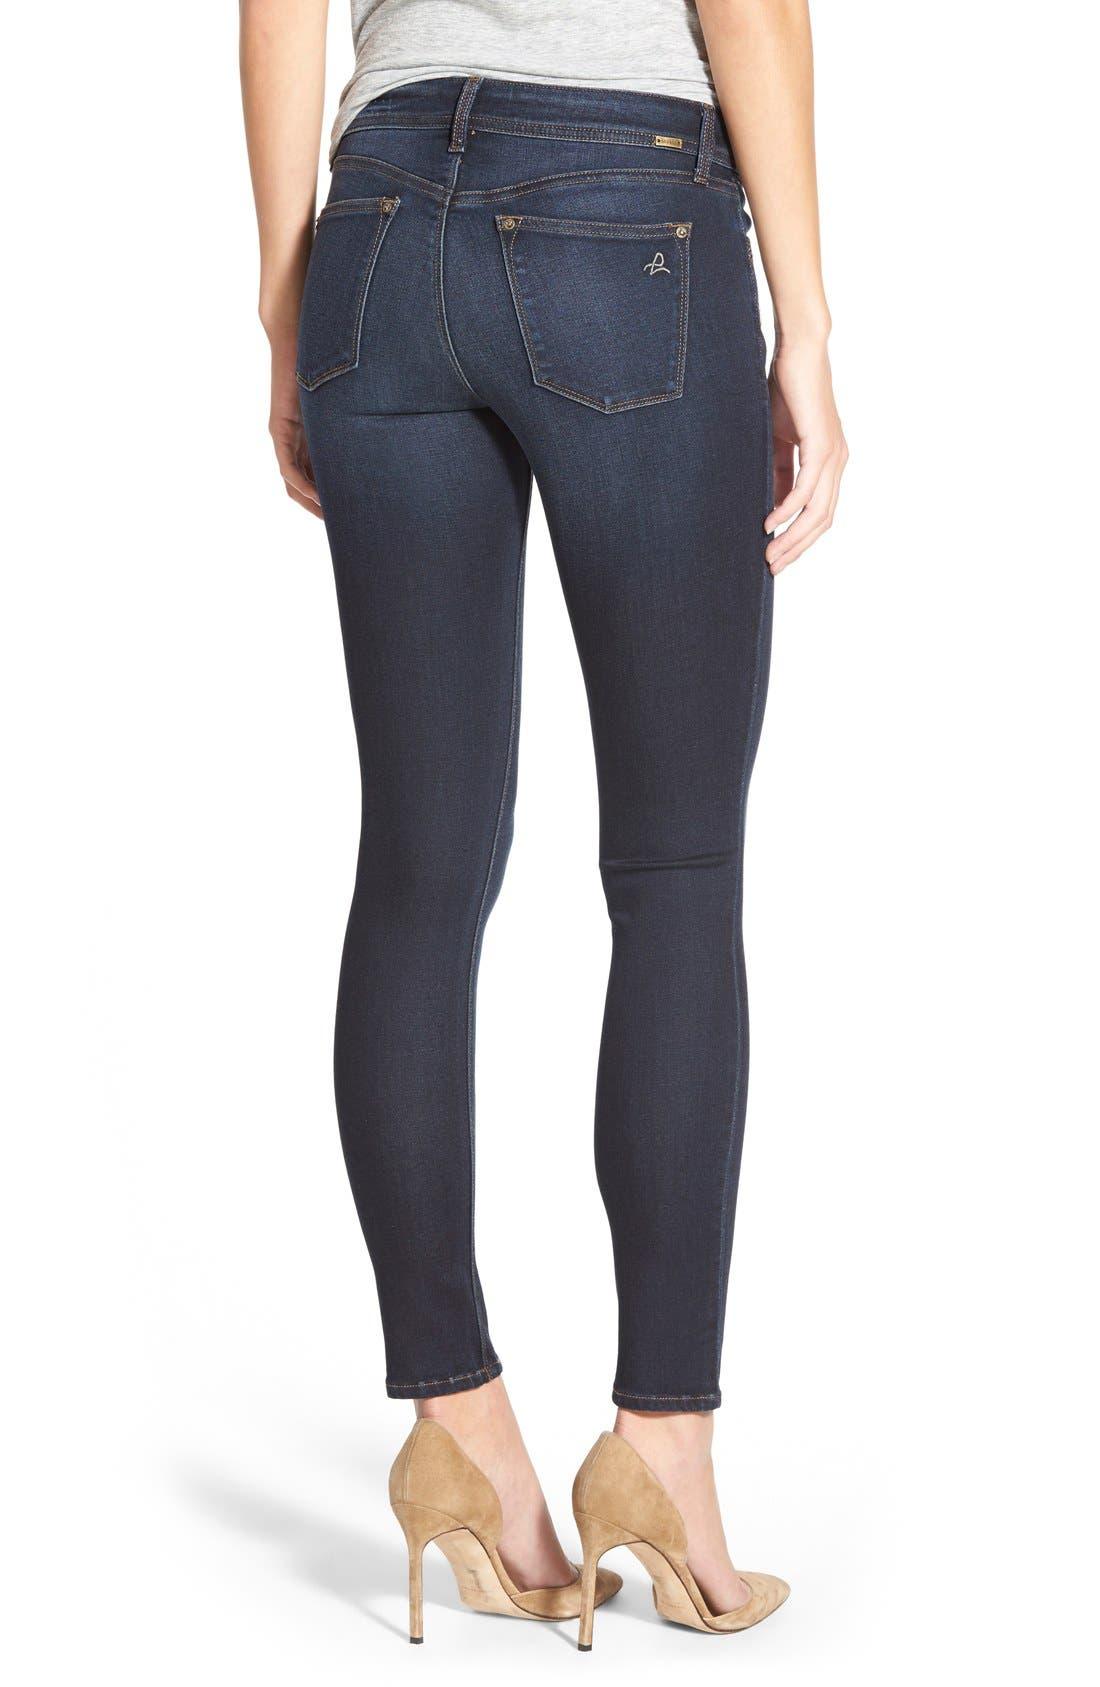 Alternate Image 3  - DL1961 'Emma' Power Legging Jeans (Walton)